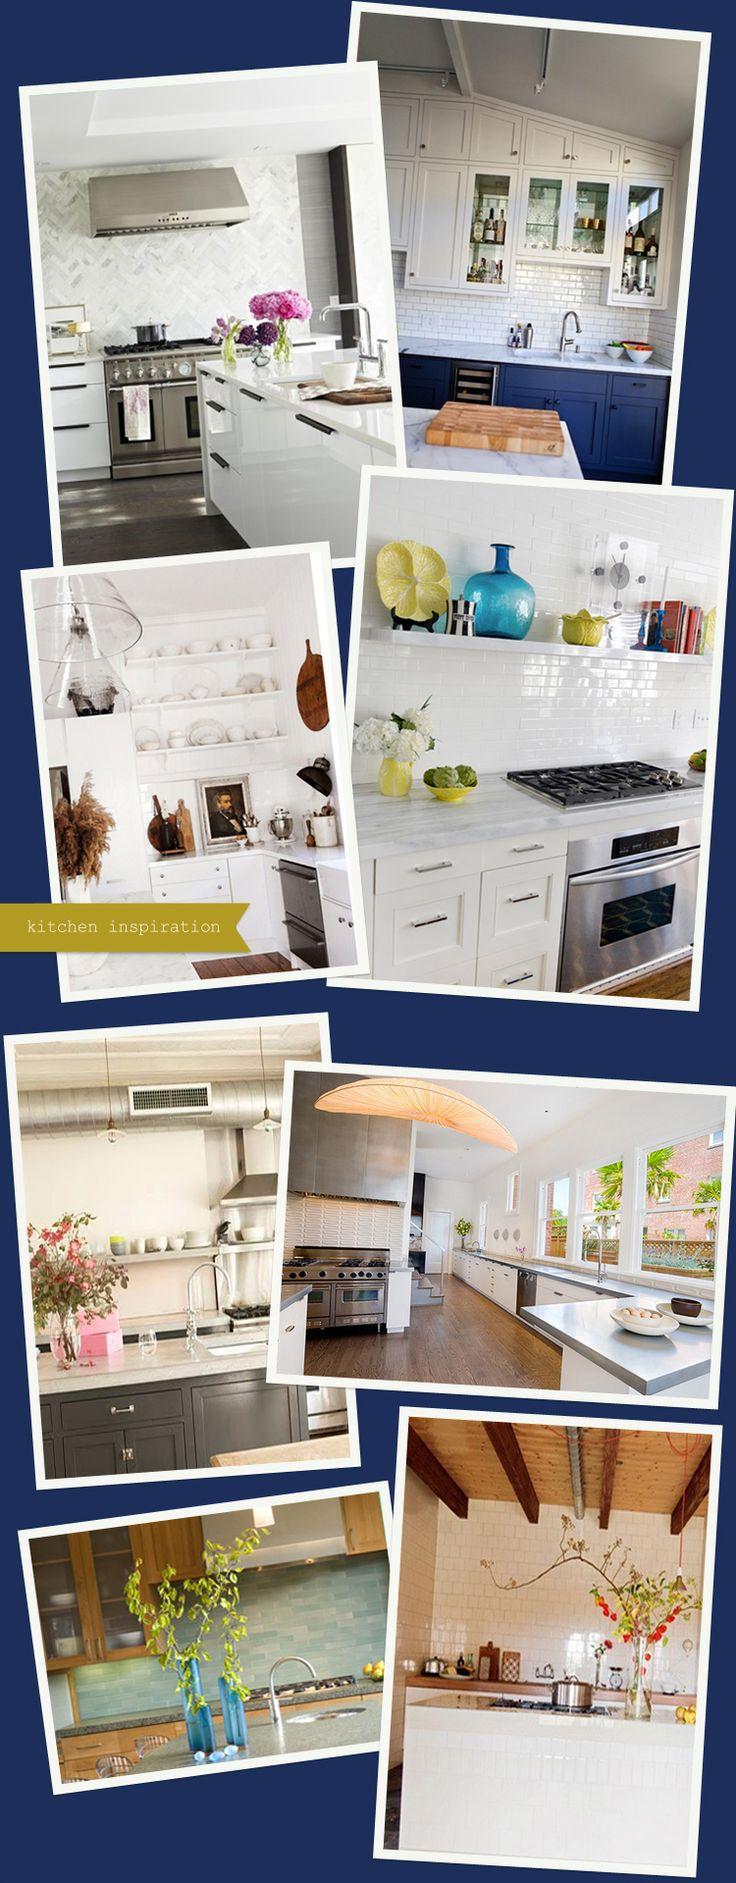 kitchen inspiration | Home | Pinterest | Inspiration